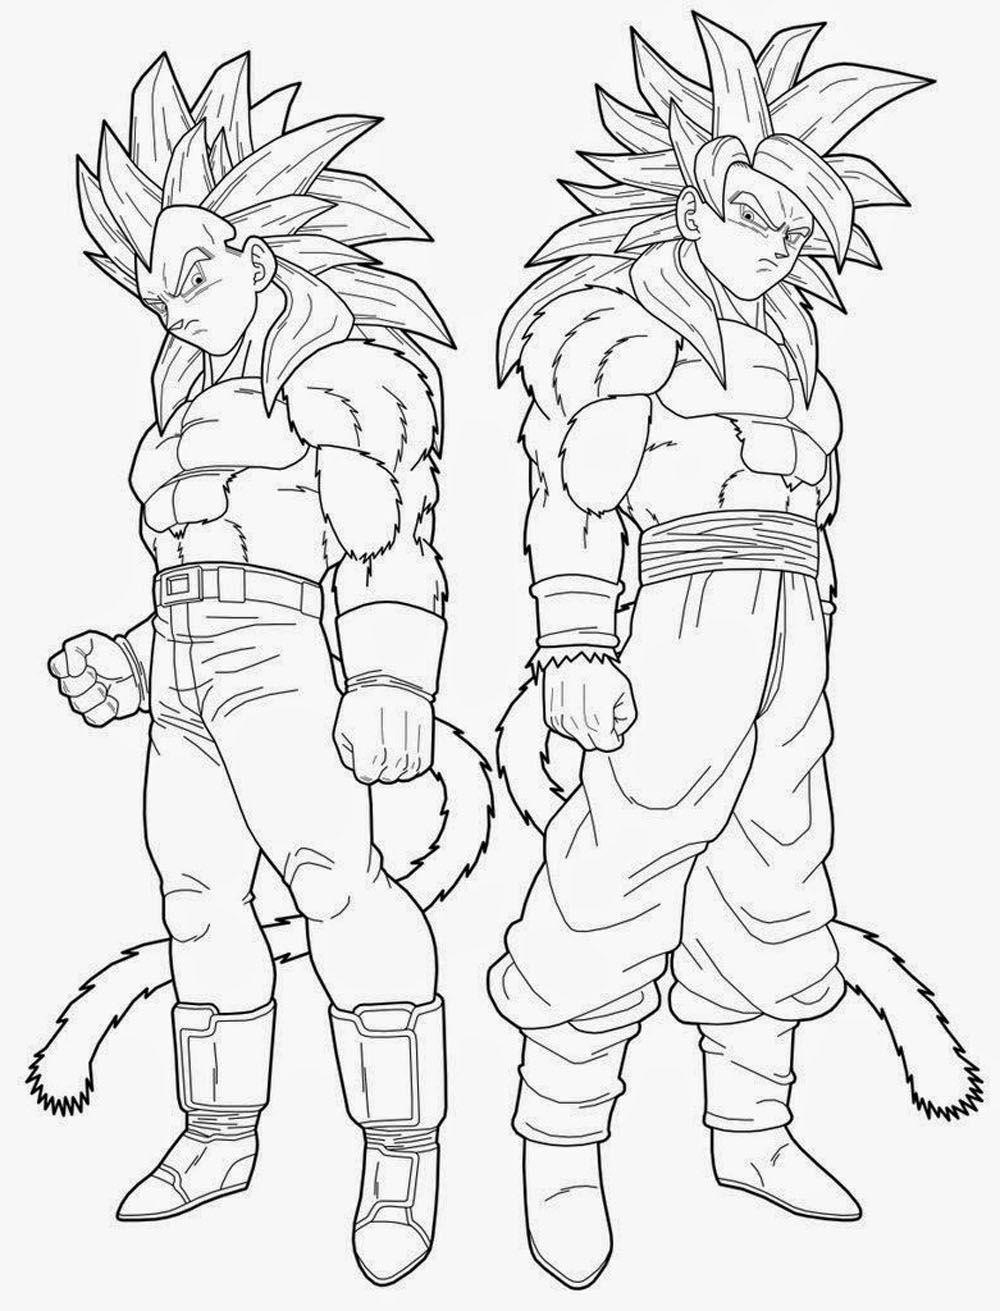 Dibujo de Goku y Vegeta fase 4 de drago | Goku | Pinterest | Dragon ...